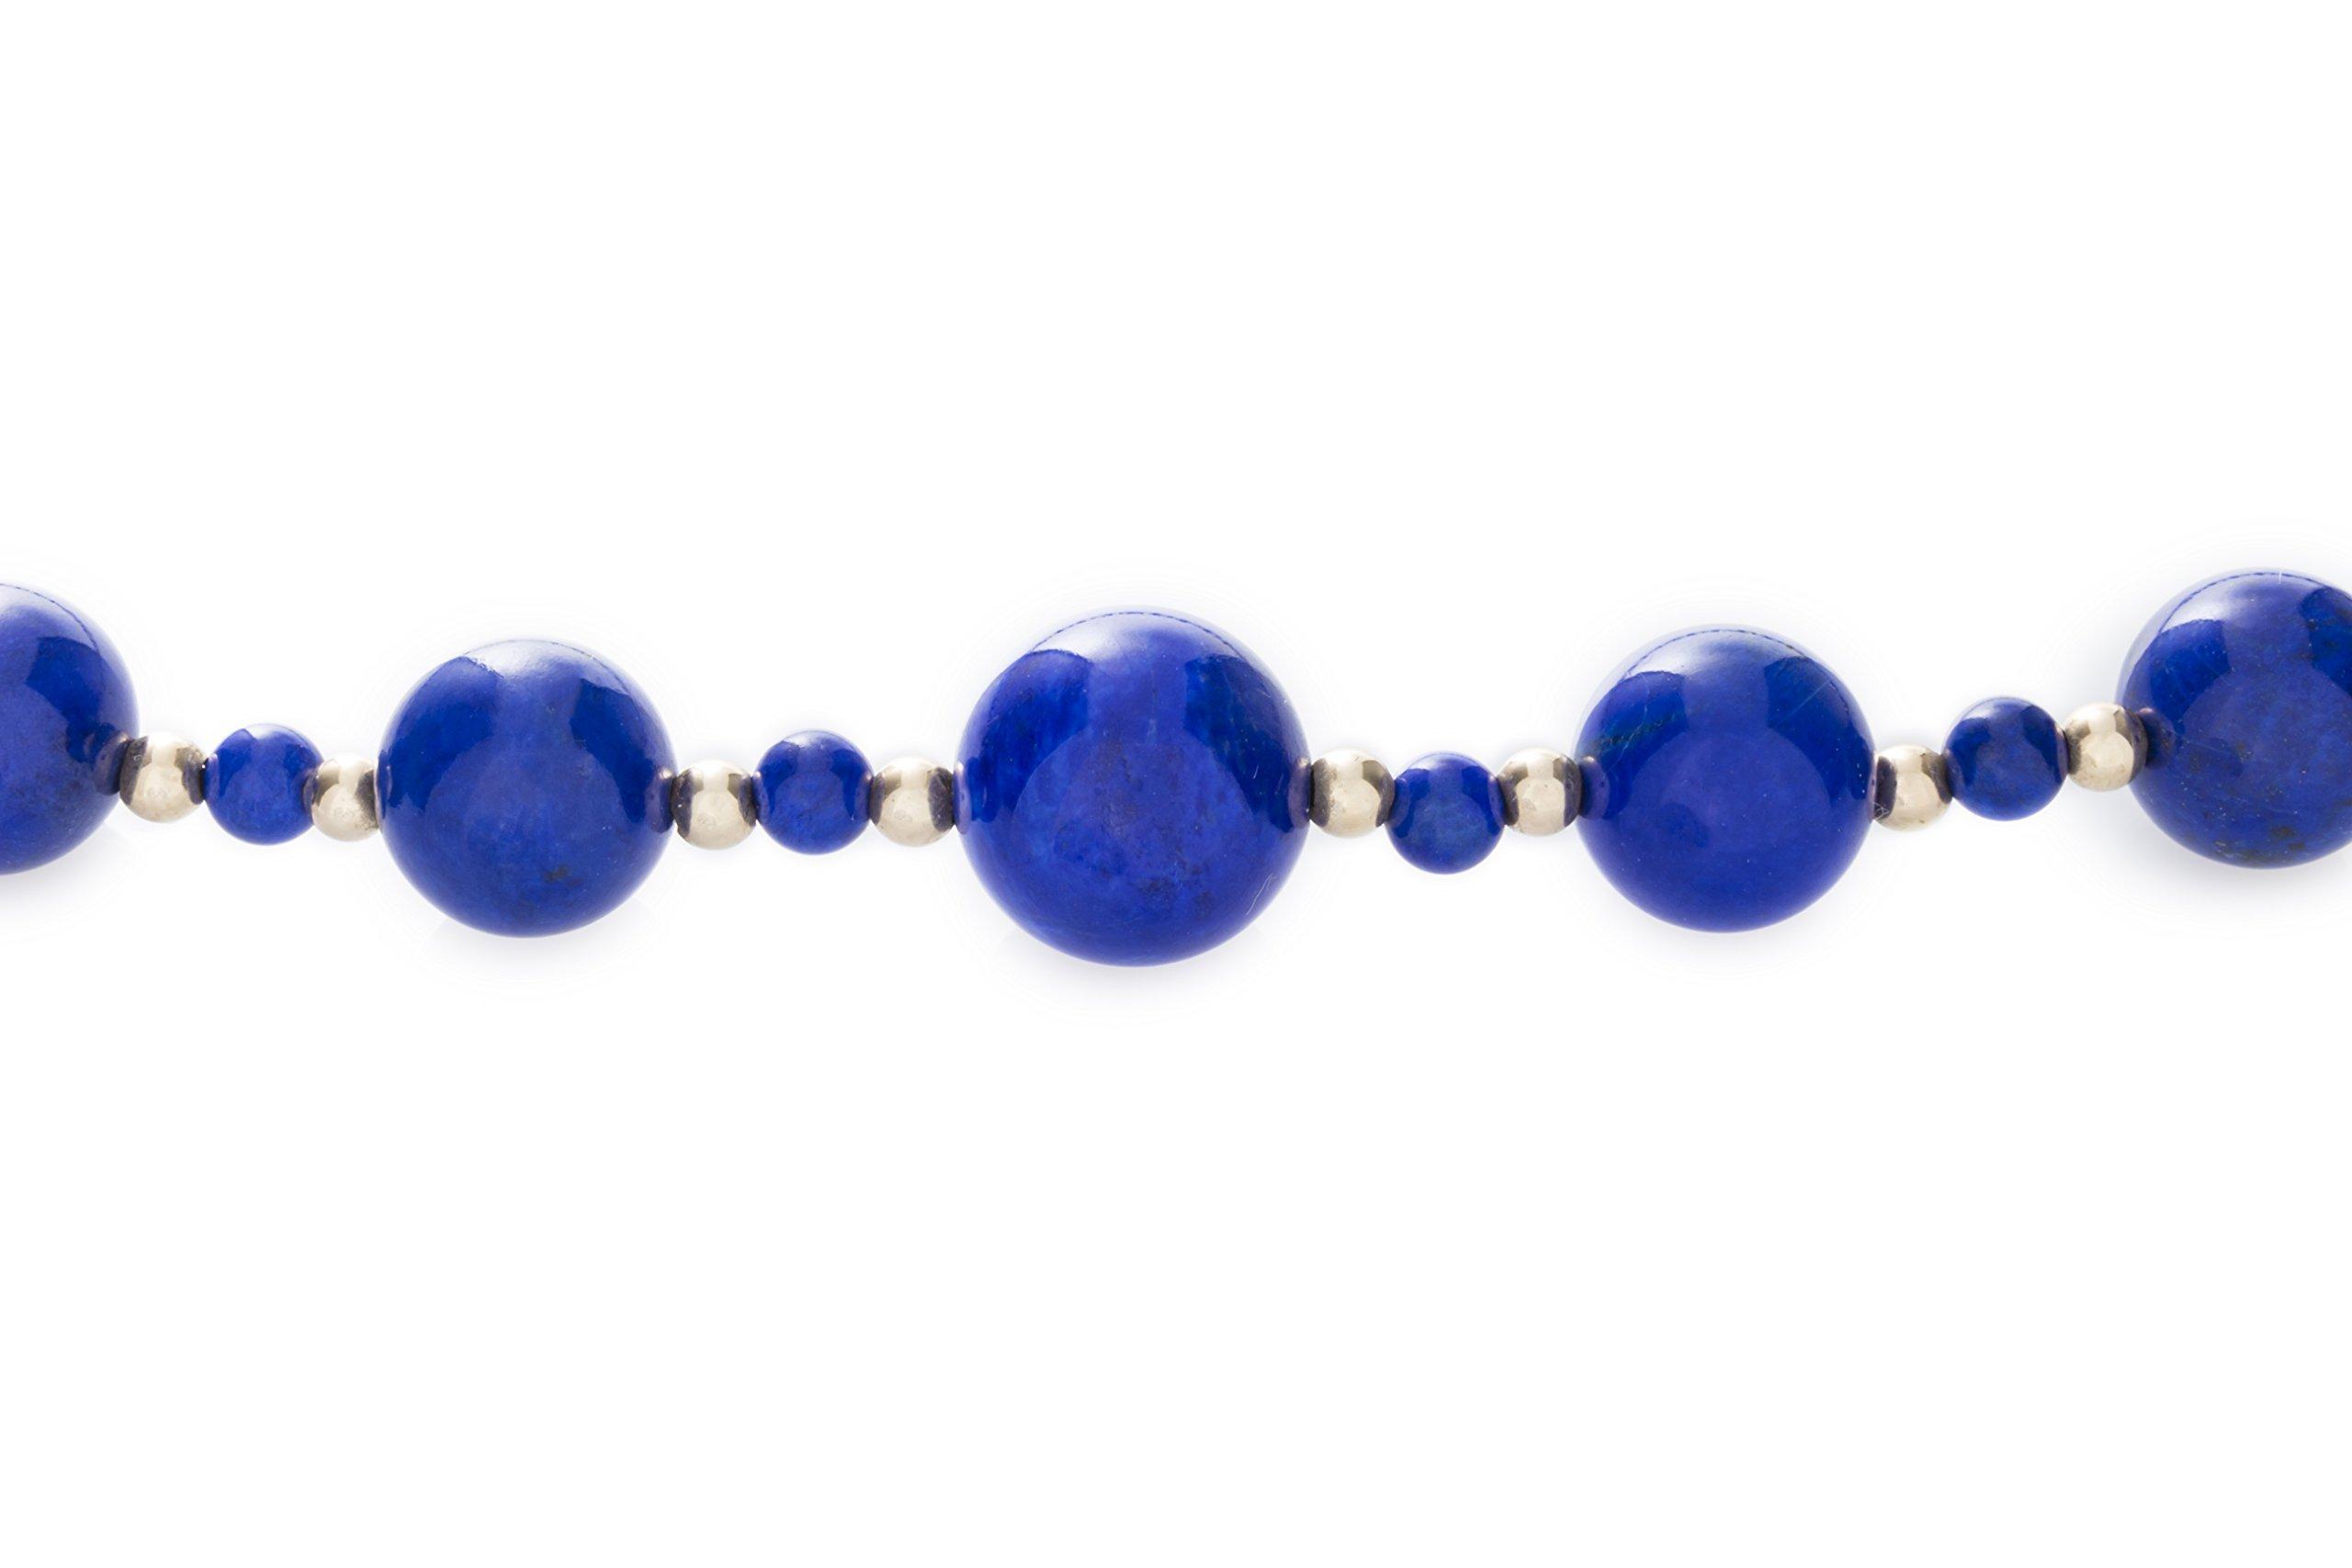 ISAAC WESTMAN 14K Yellow Gold Graduated Lapis Lazuli Gemstone Beaded Necklace | 20'' Matinee Length by ISAAC WESTMAN (Image #5)